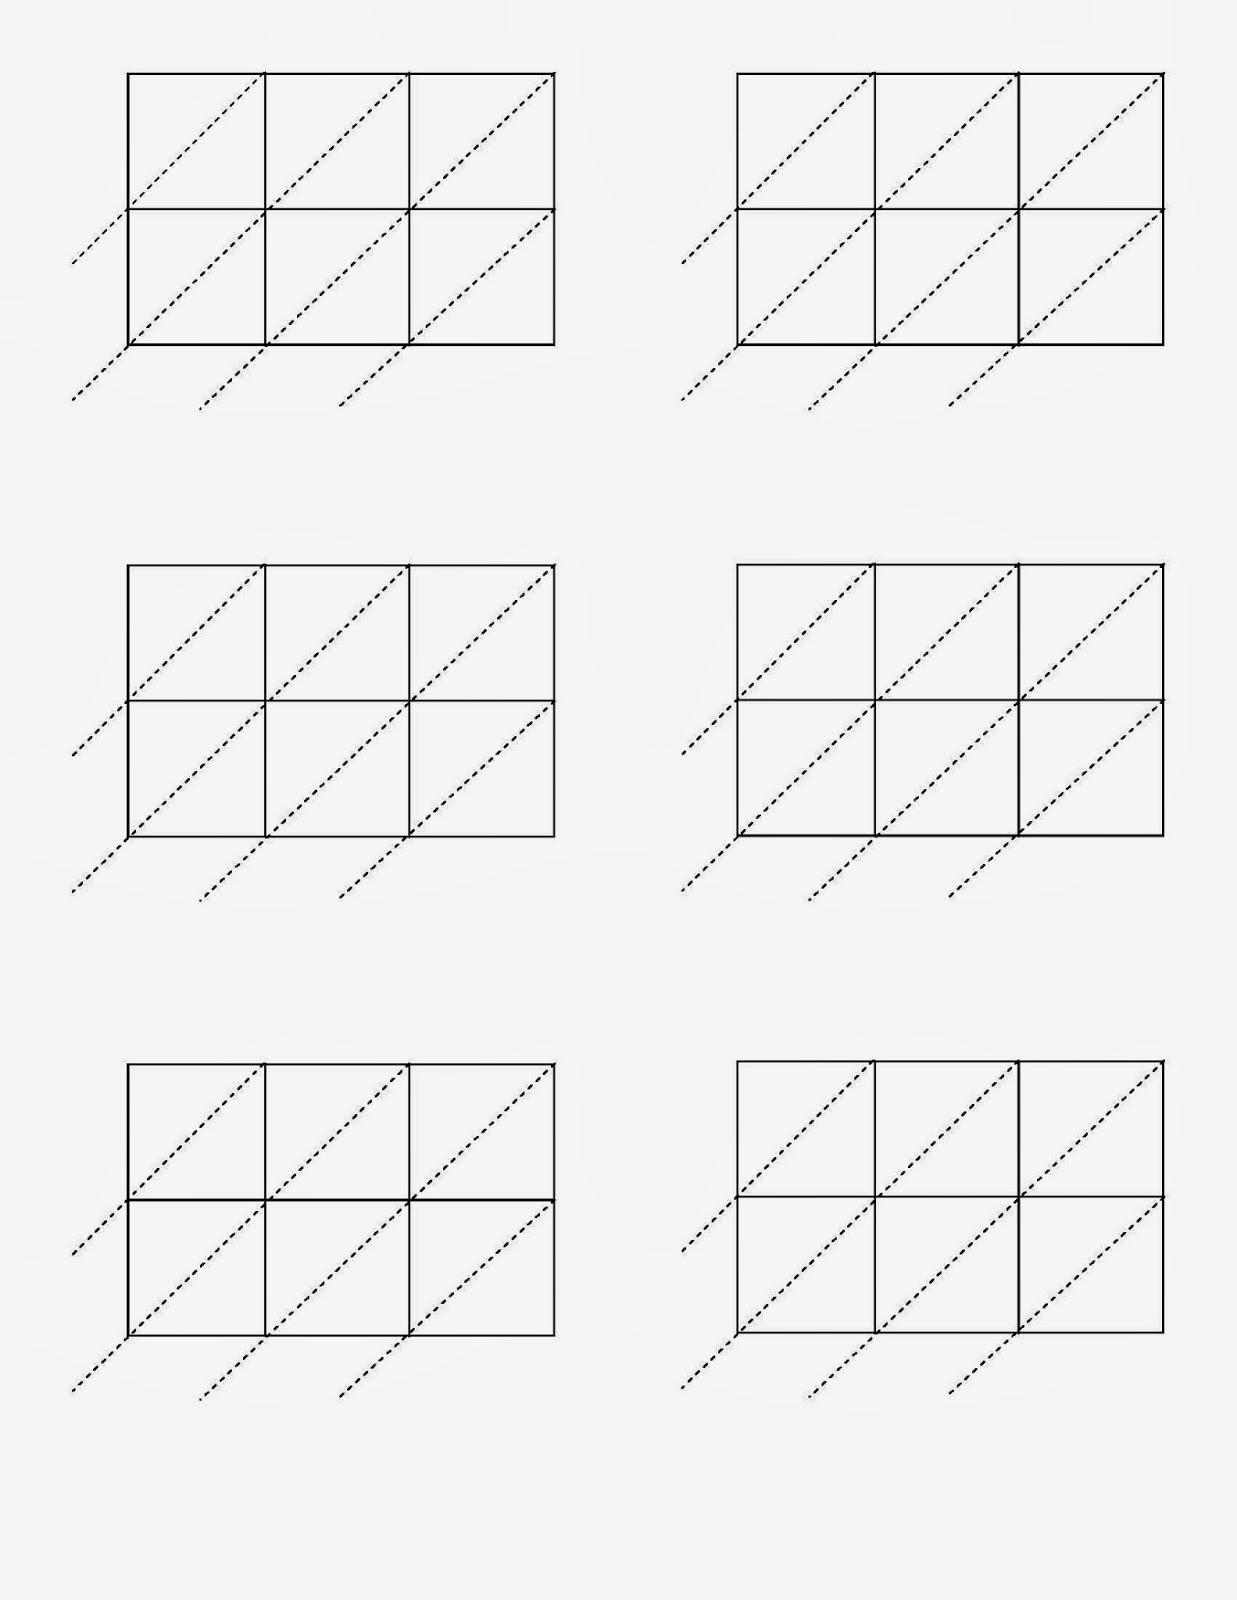 Free Printable Lattice Multiplication Grids